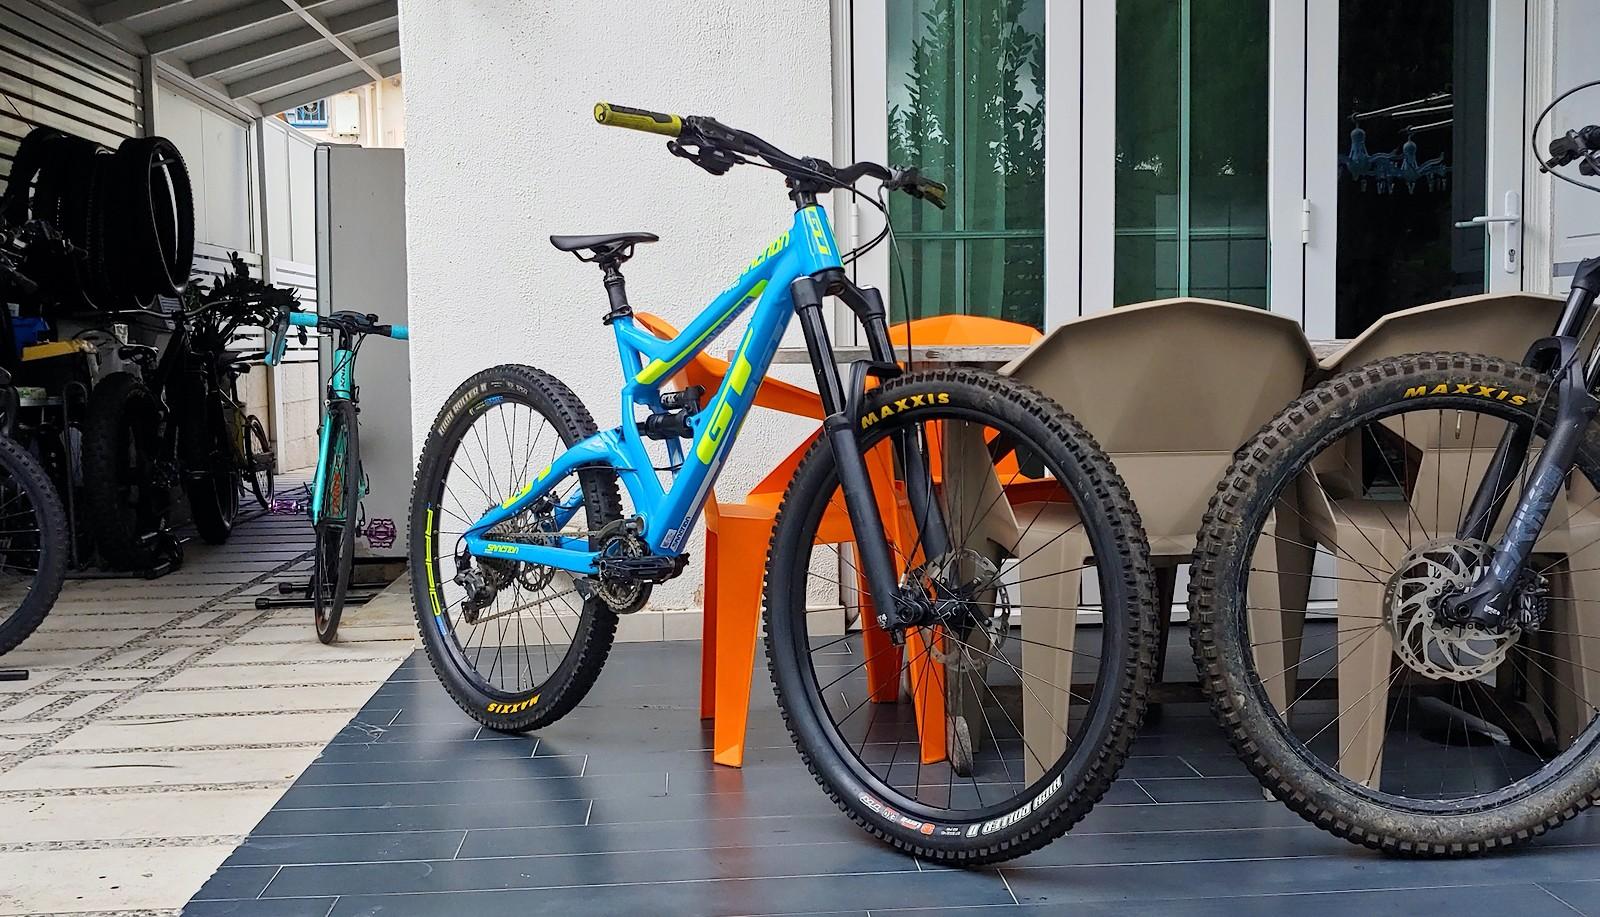 GT Sanction Pro Ver.2020 Enduro Bike (ZEROMON Tuning™)